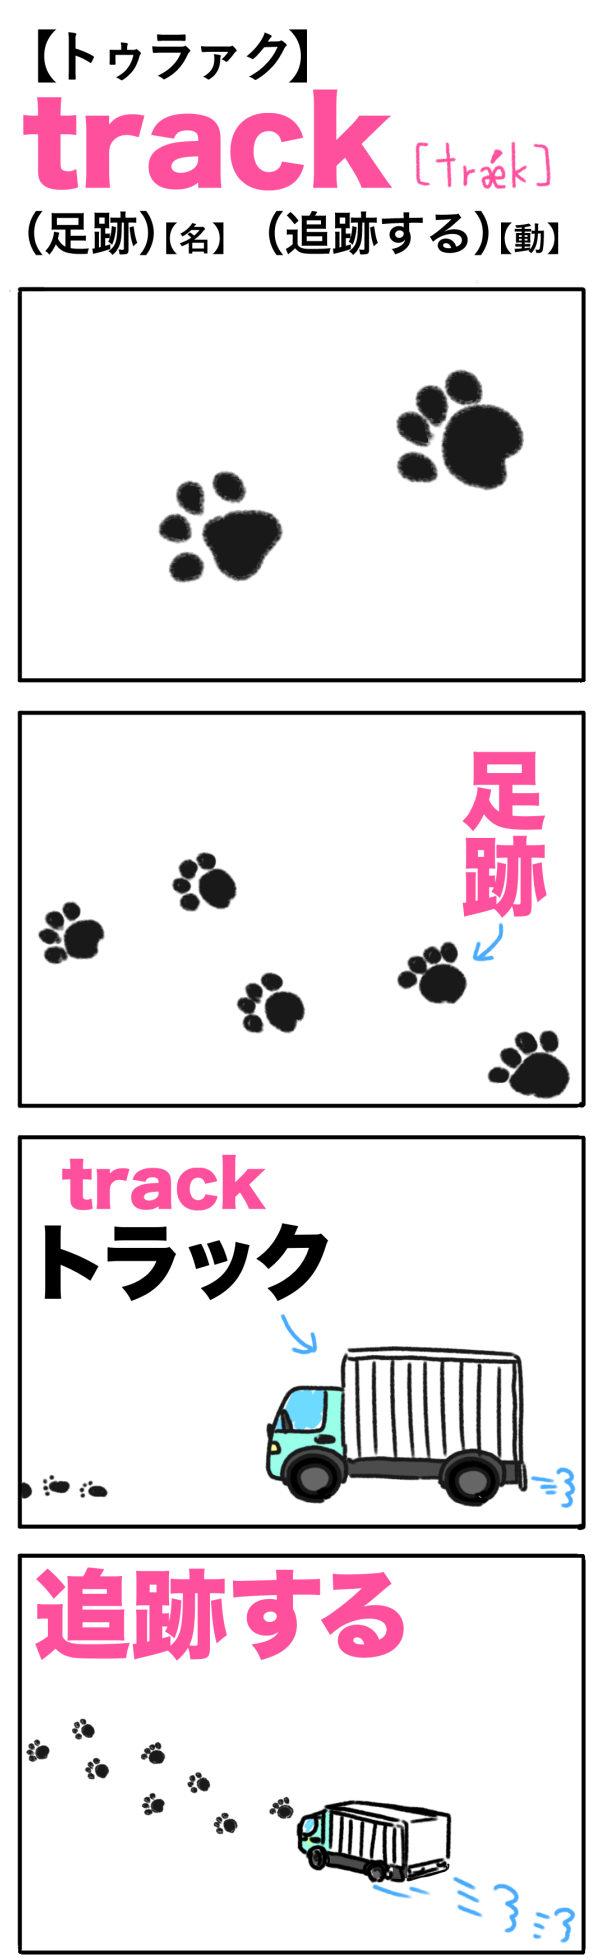 track(足跡)(追跡する)の語呂合わせ英単語